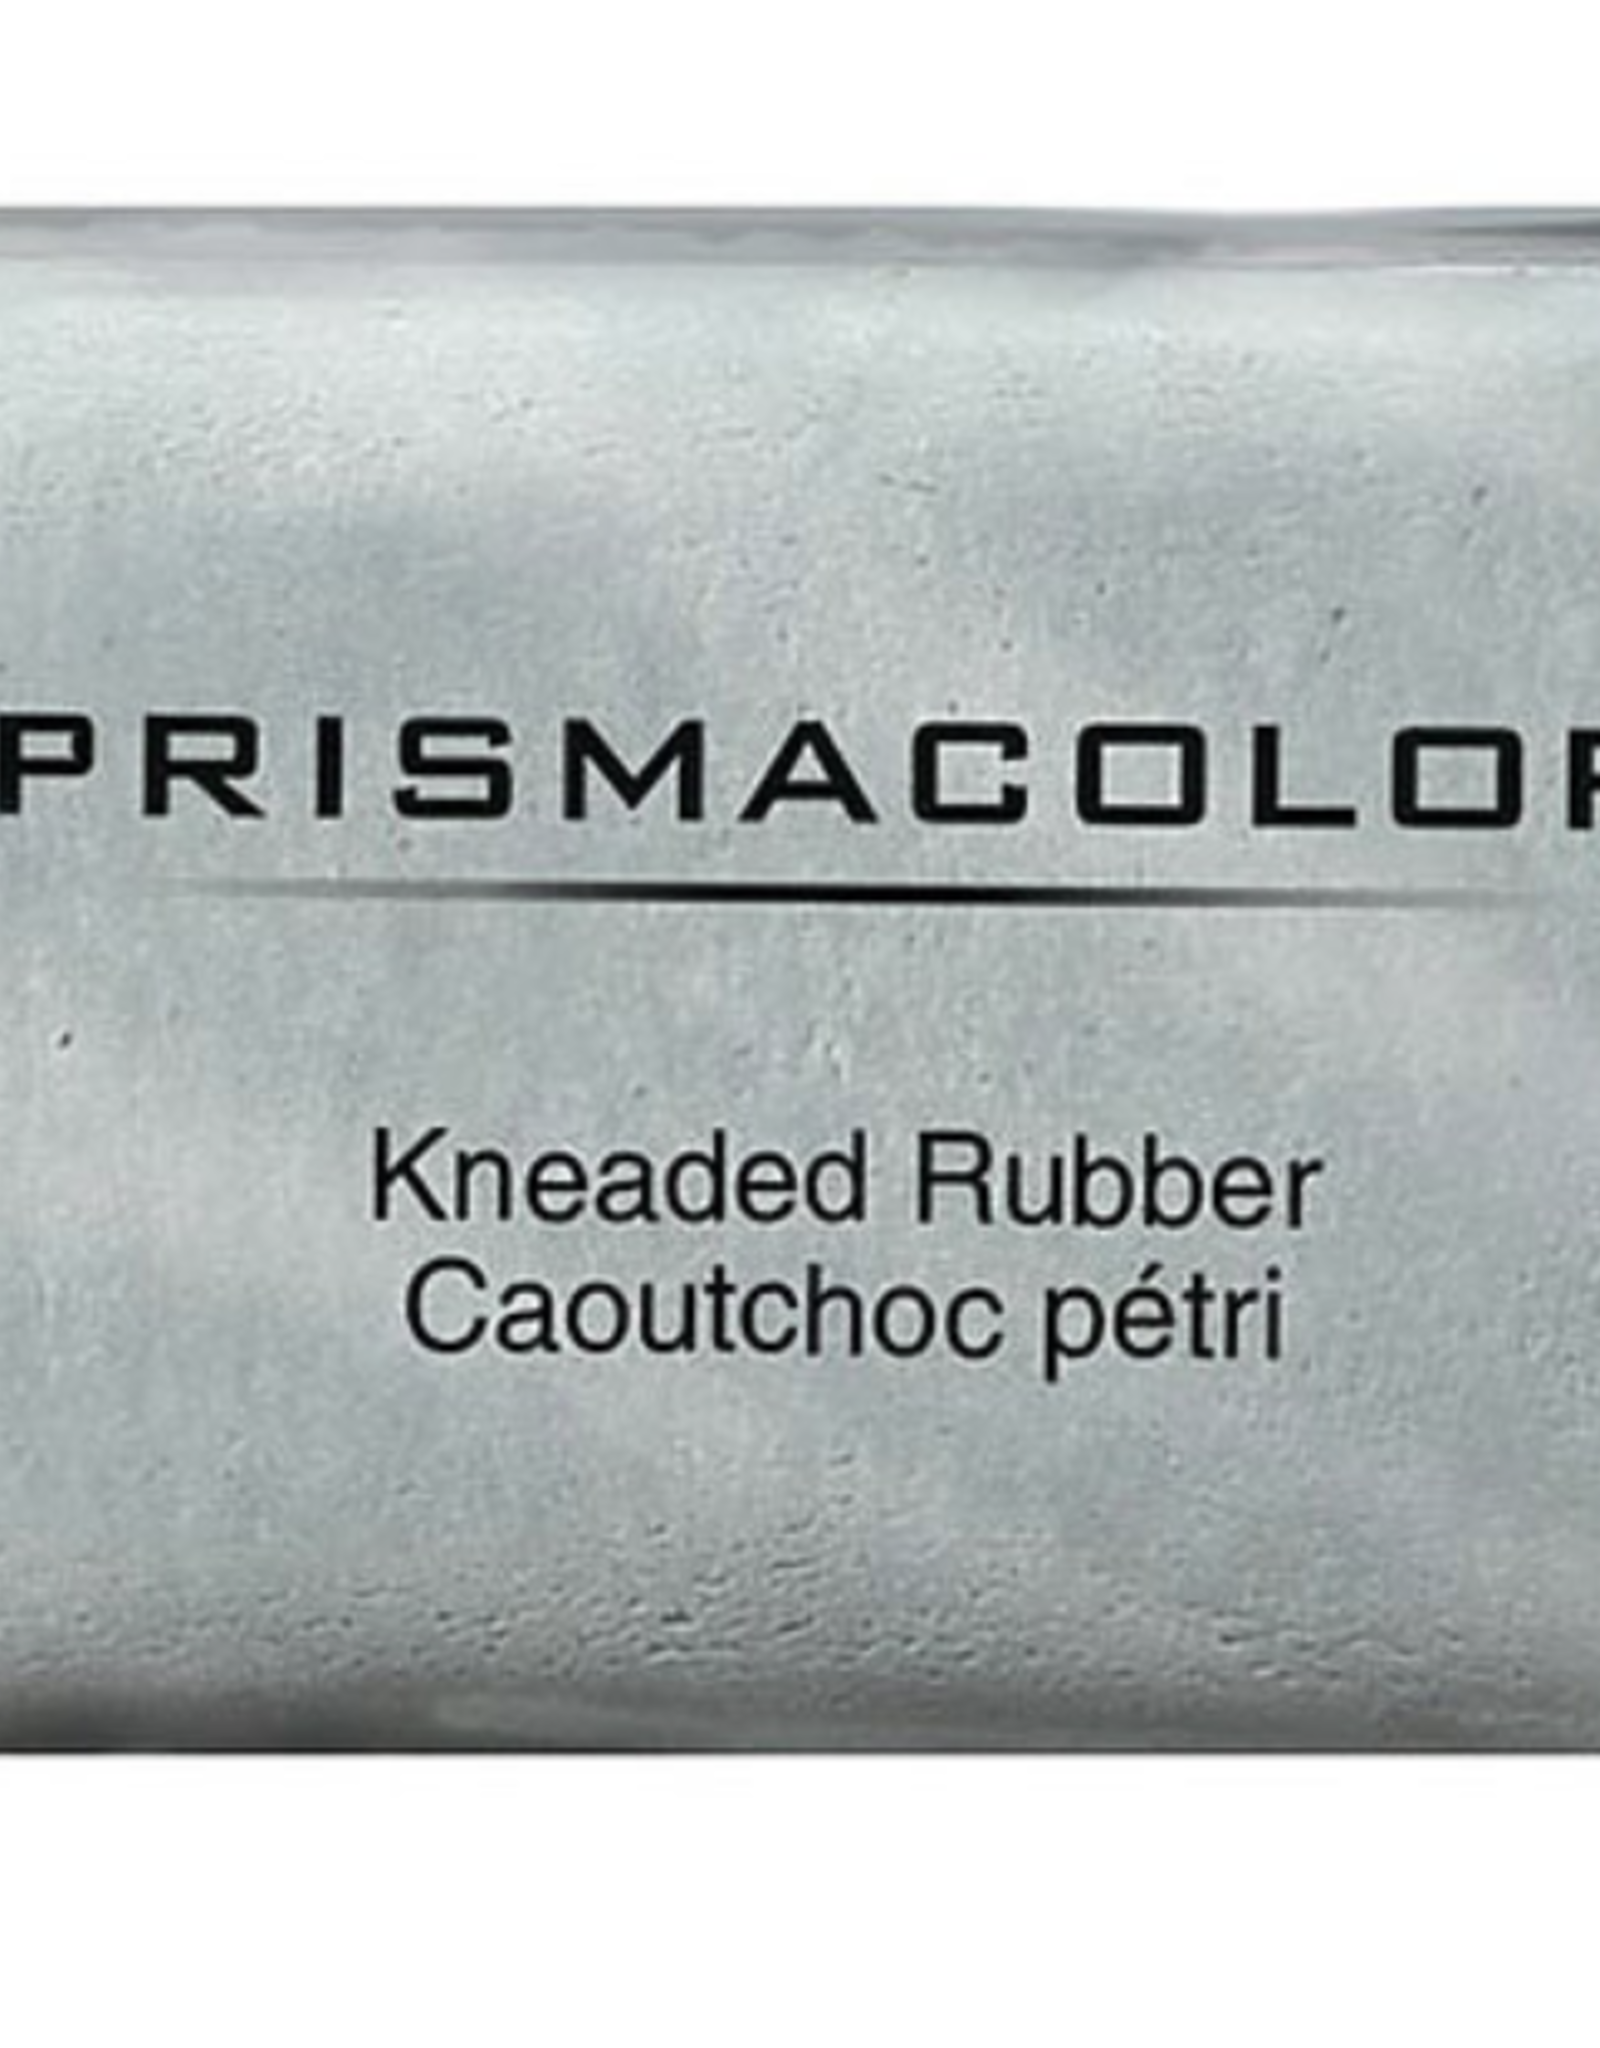 Prismacolor Kneaded Rubber Eraser, Medium Size